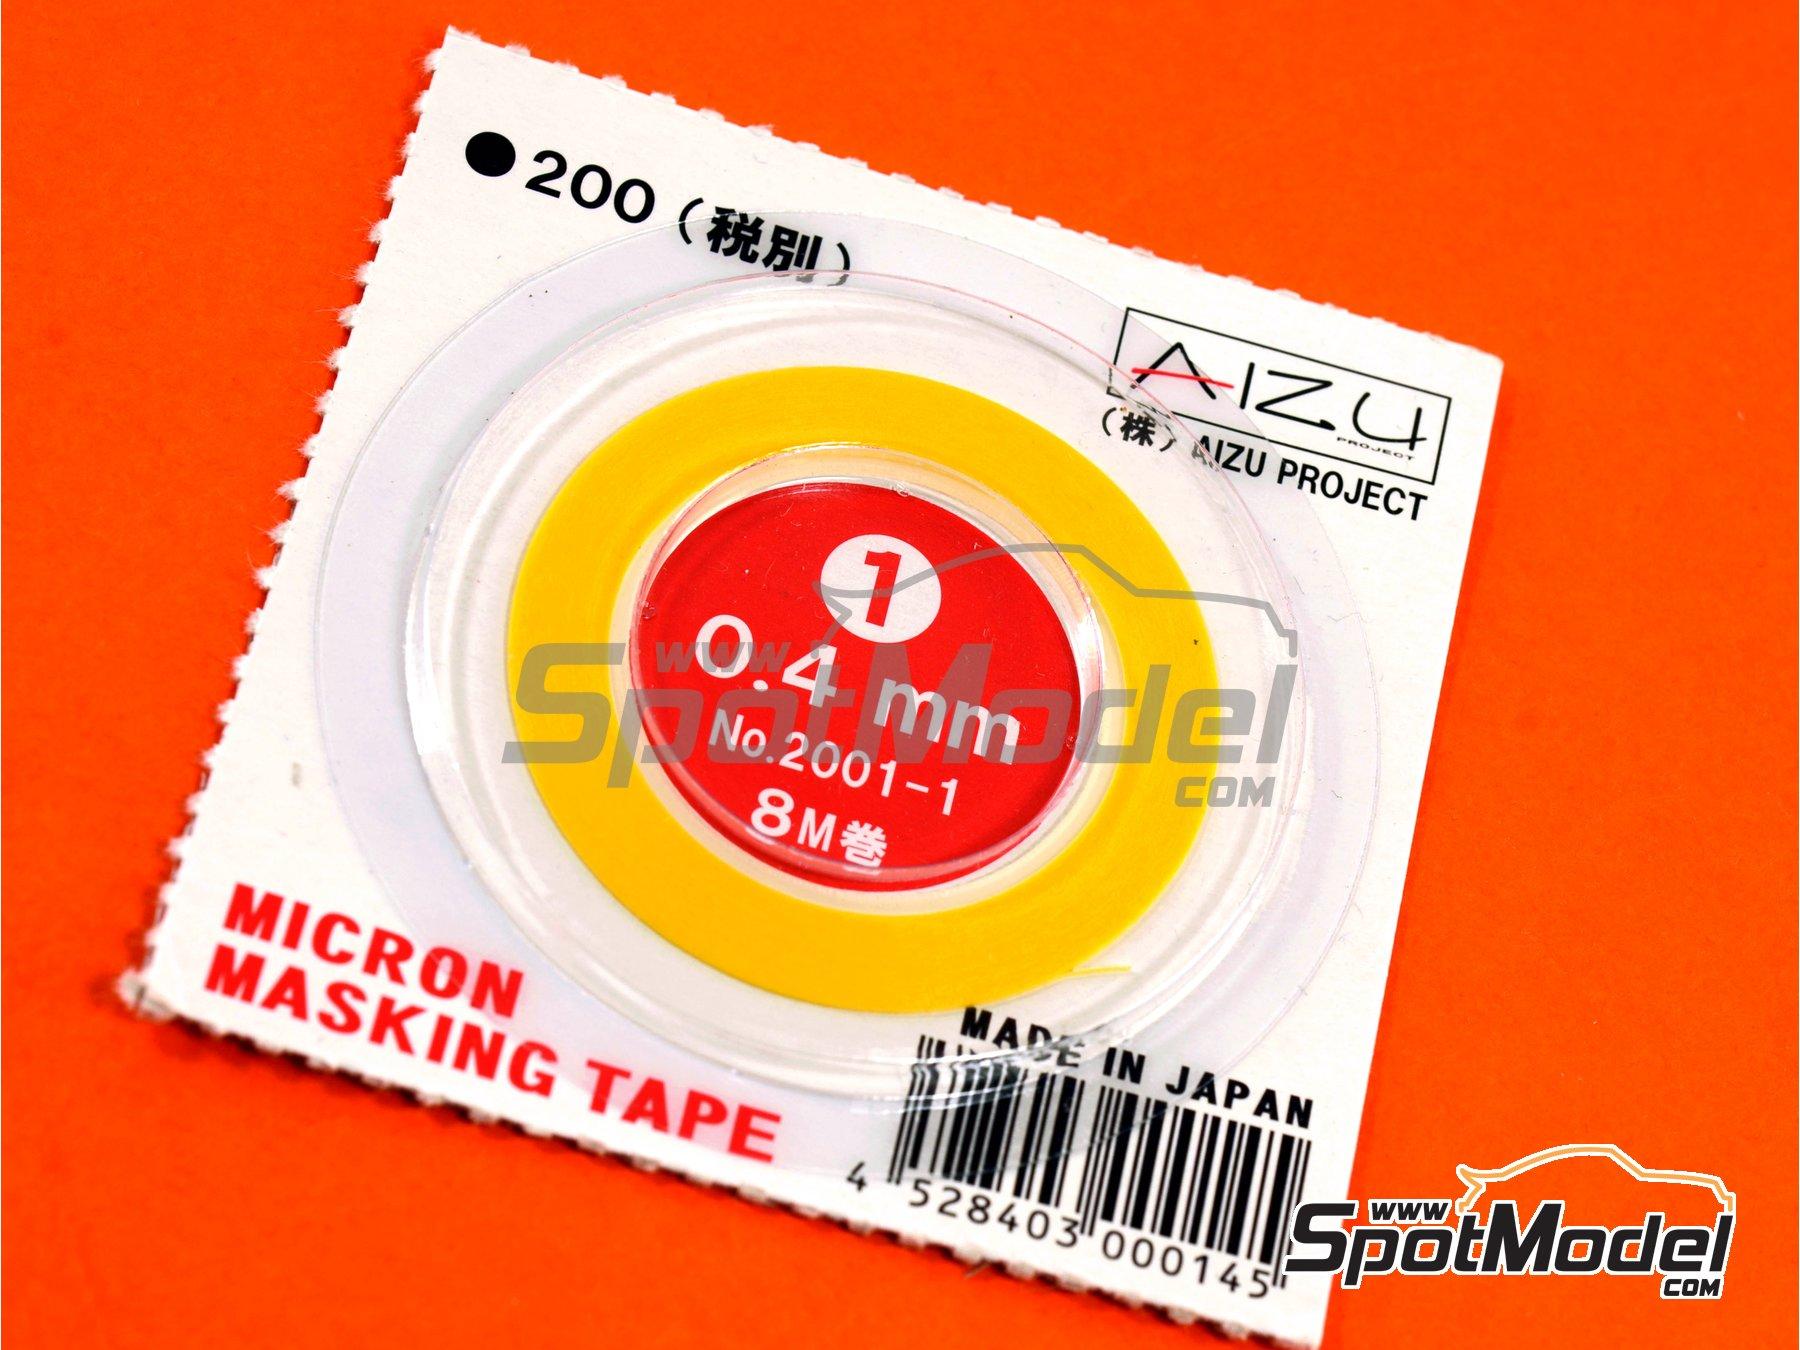 Image 1: Micron masking tape 0,4mm x 8m | Masks manufactured by Aizu Project (ref.AIZU-2001-1)